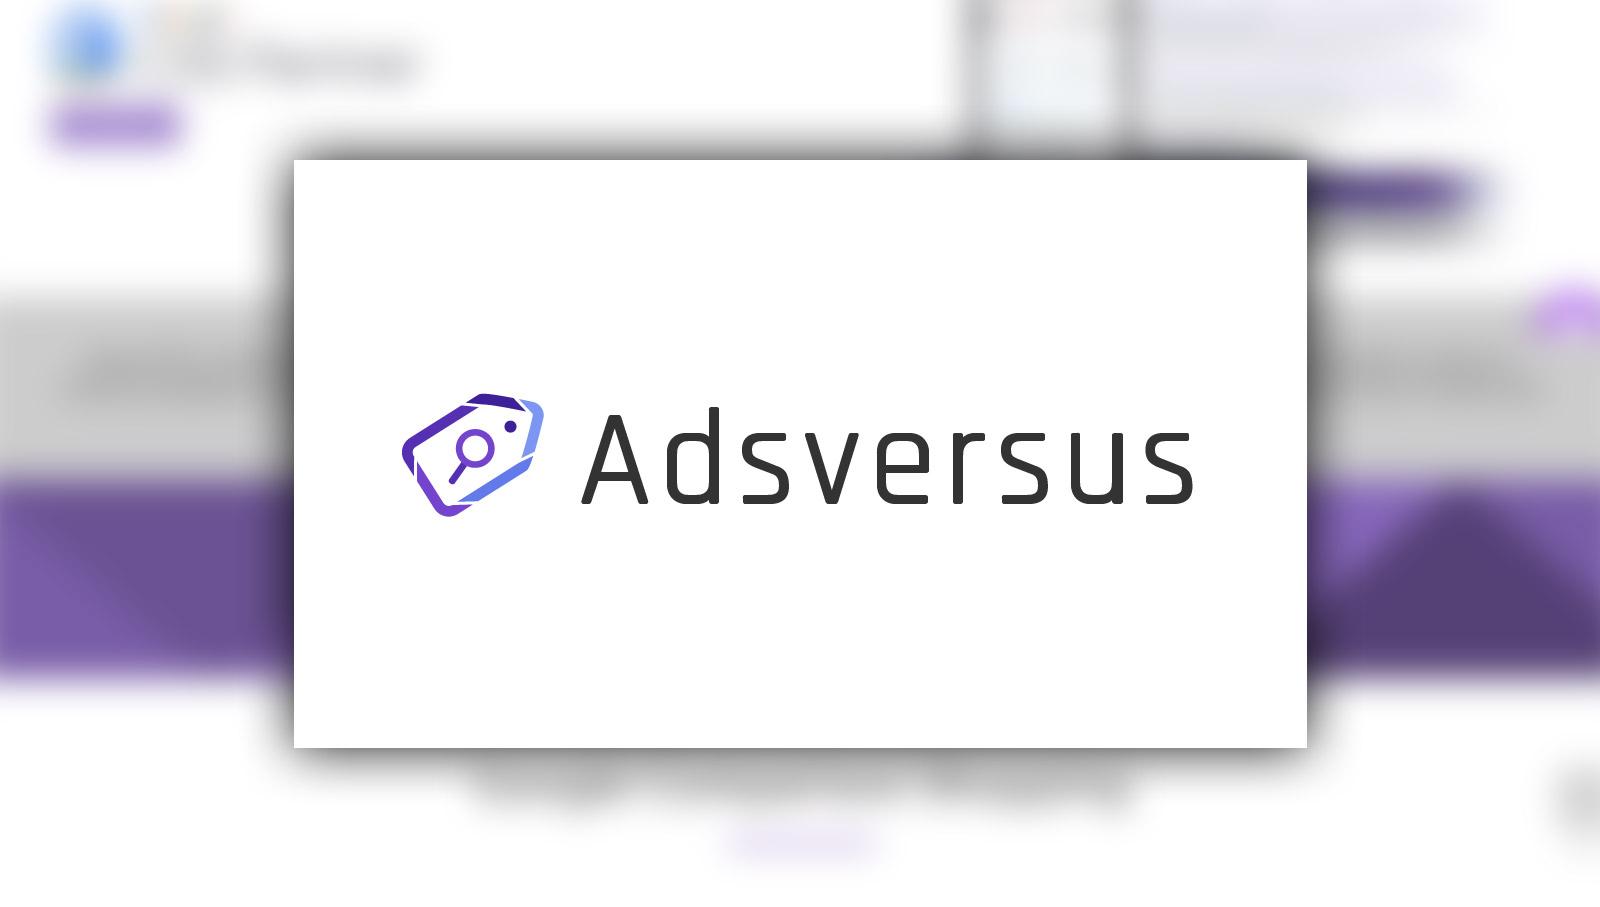 adsversus-3